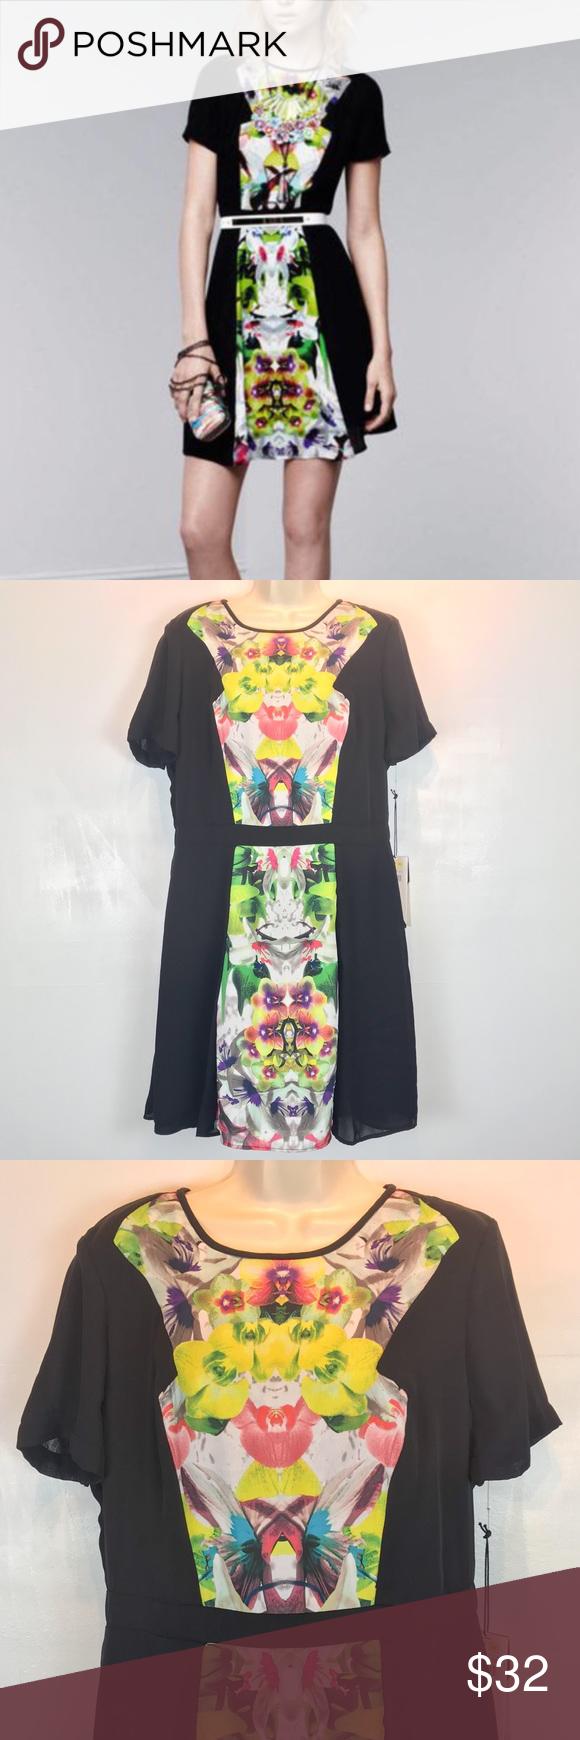 Nwt Prabal Gurung For Target Dress Sz 14 Black Floral Print Dress Floral Dress Black Prabal Gurung [ 1740 x 580 Pixel ]